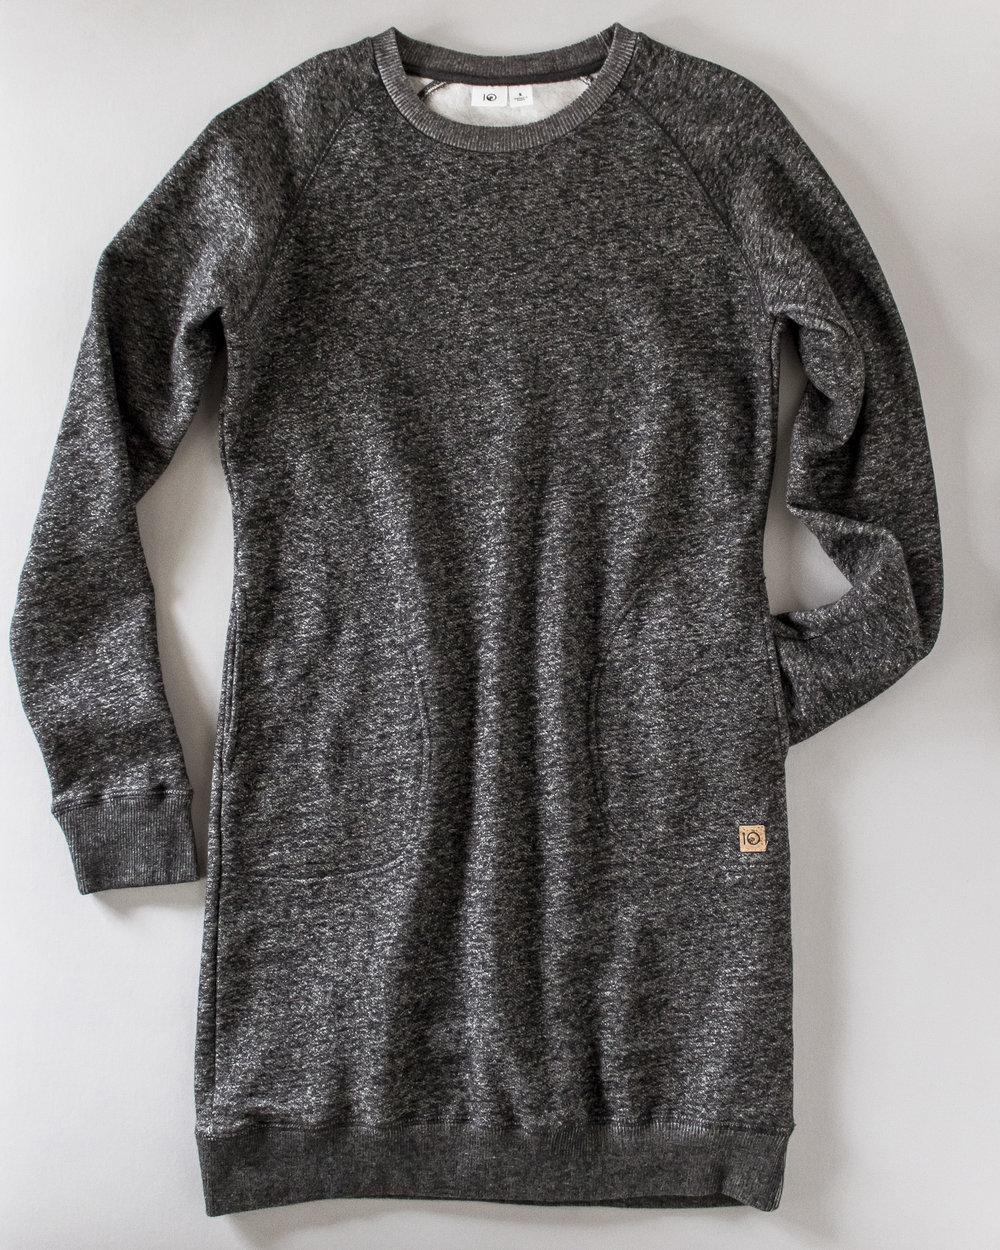 sweatshirt_dress.JPG